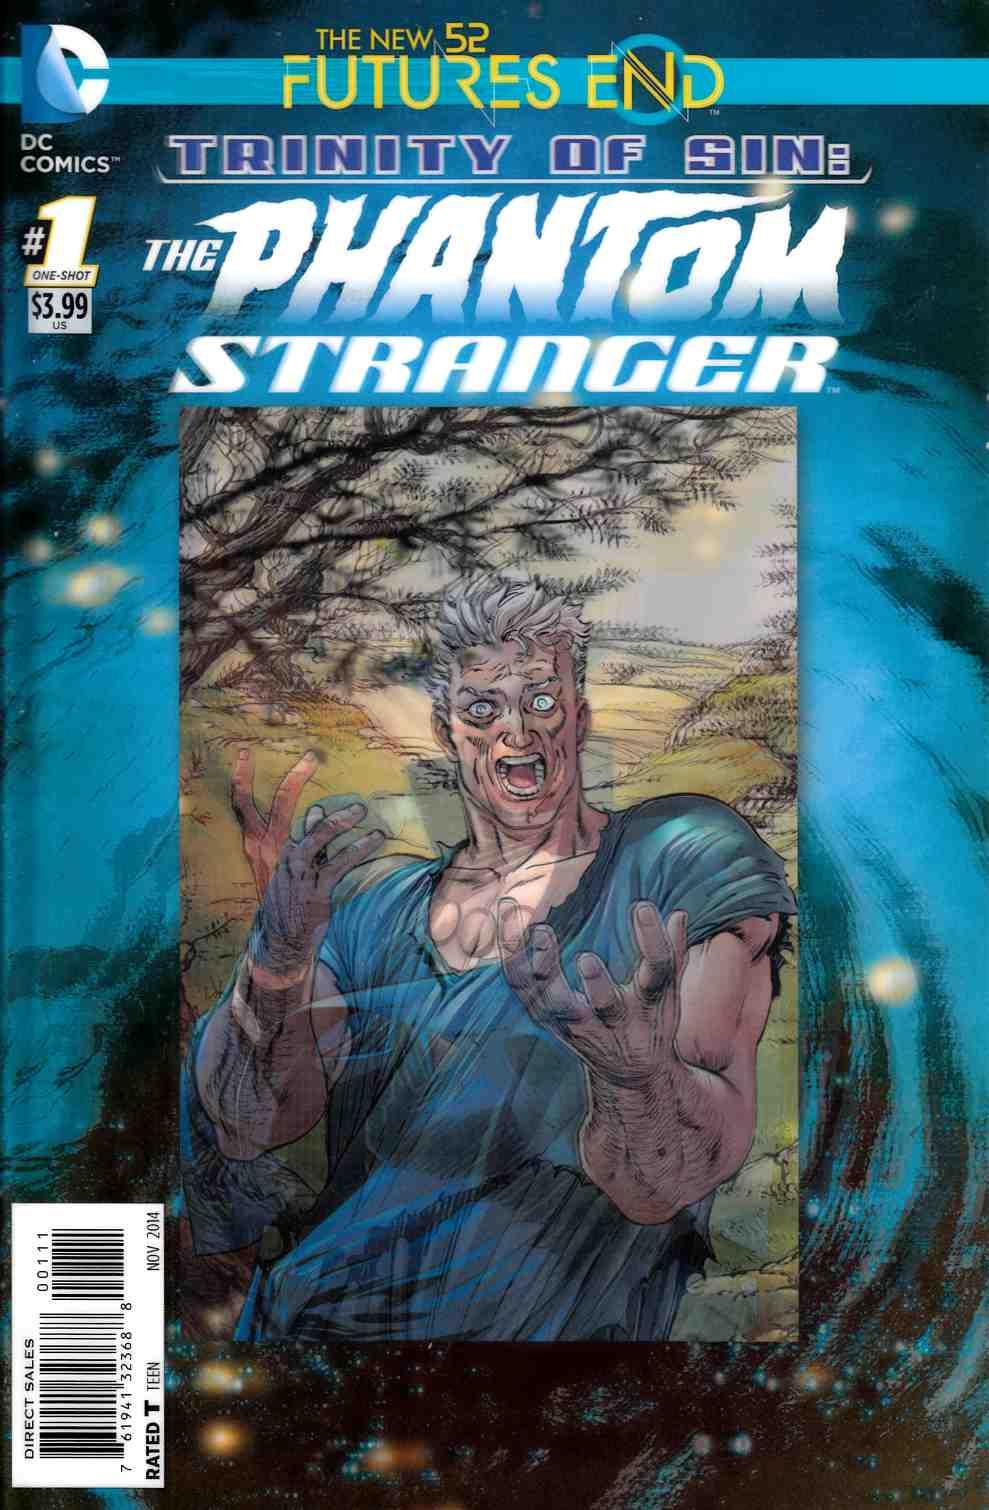 New 52 Futures End (2014) Trinity of Sin The Phantom Stranger One Shot - Used